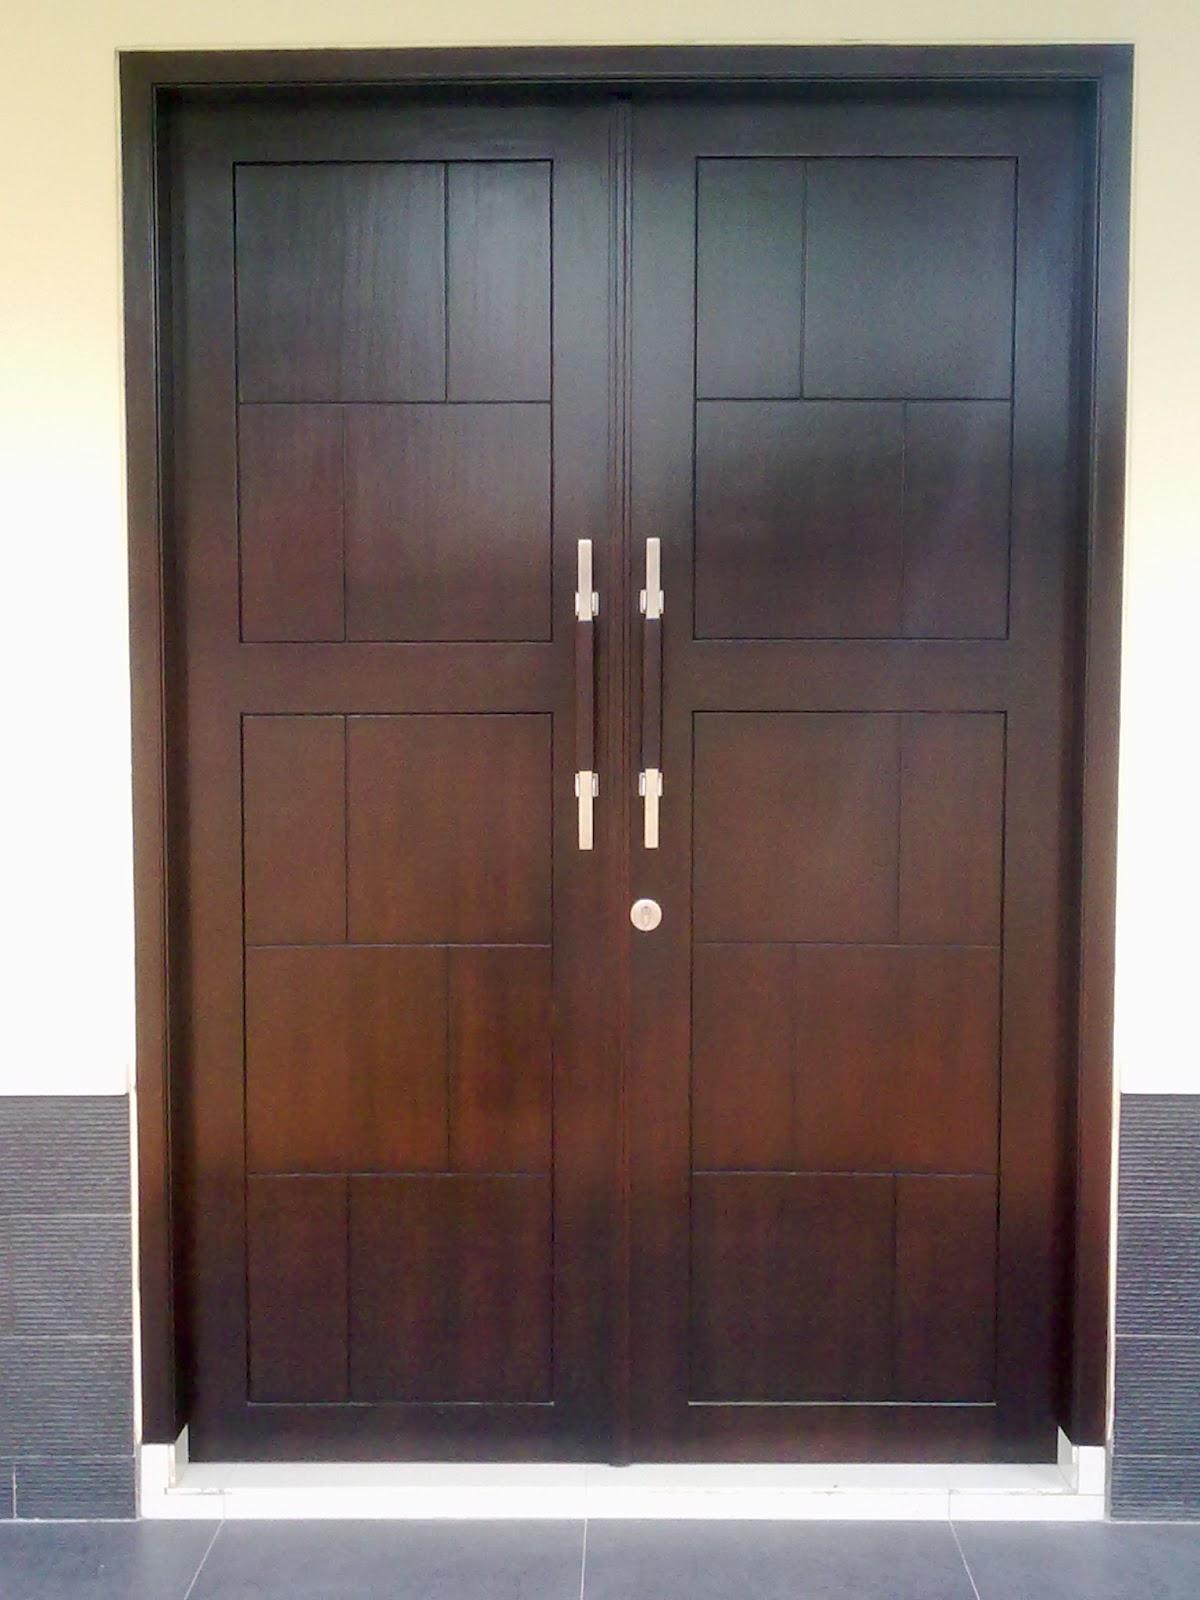 Desain Pintu Rumah Minimalis Modern Minimalist Design Jasa